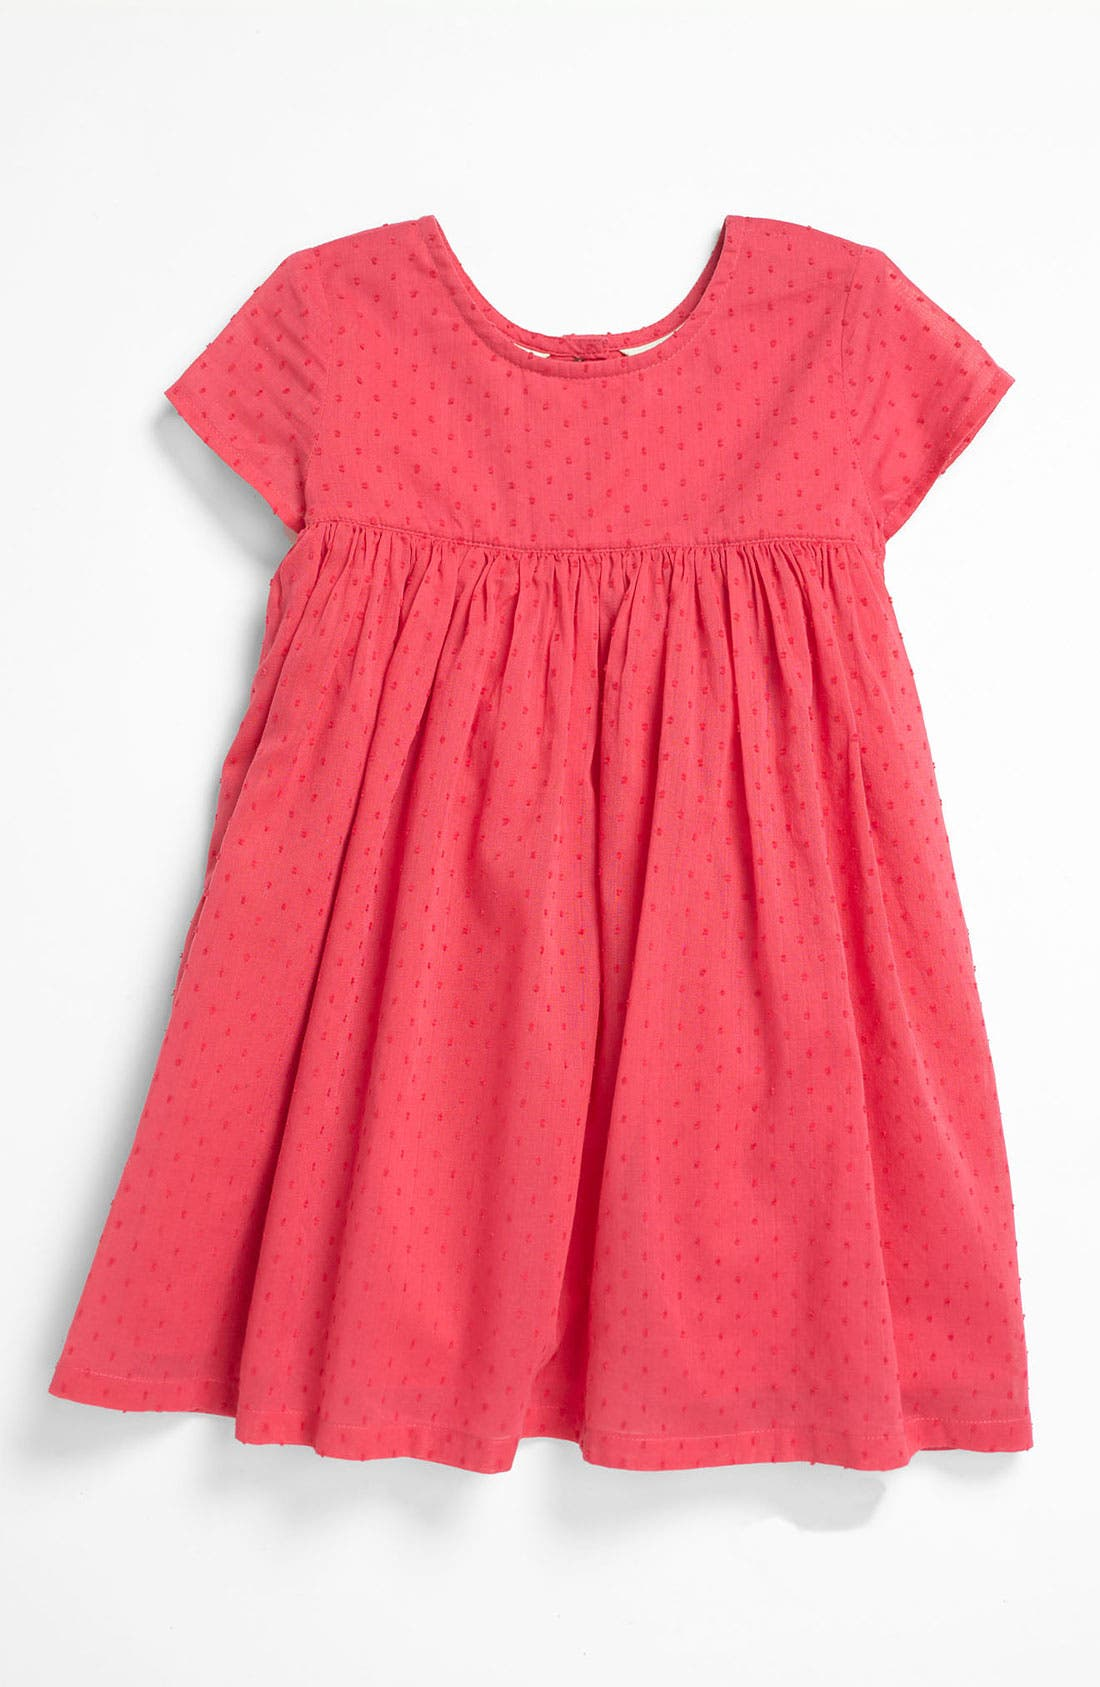 Alternate Image 1 Selected - Tucker + Tate 'Iris' Dress (Baby)